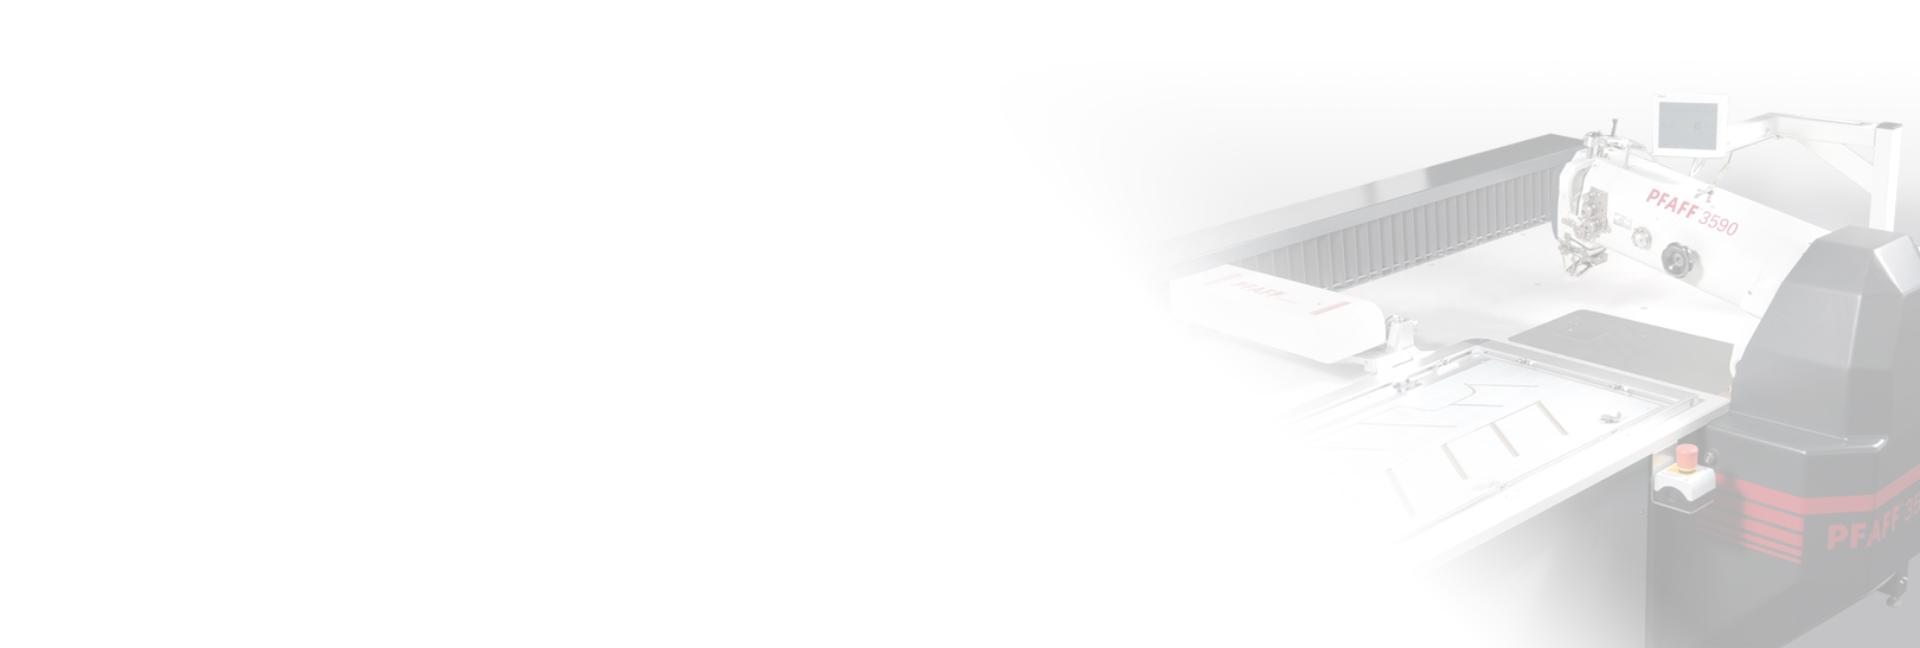 Masini de cusut industriale, service si reparatii, Botosani, Romania, Durkopp Adler, Pfaff, Brother, Pegasus, Beisler, KSL